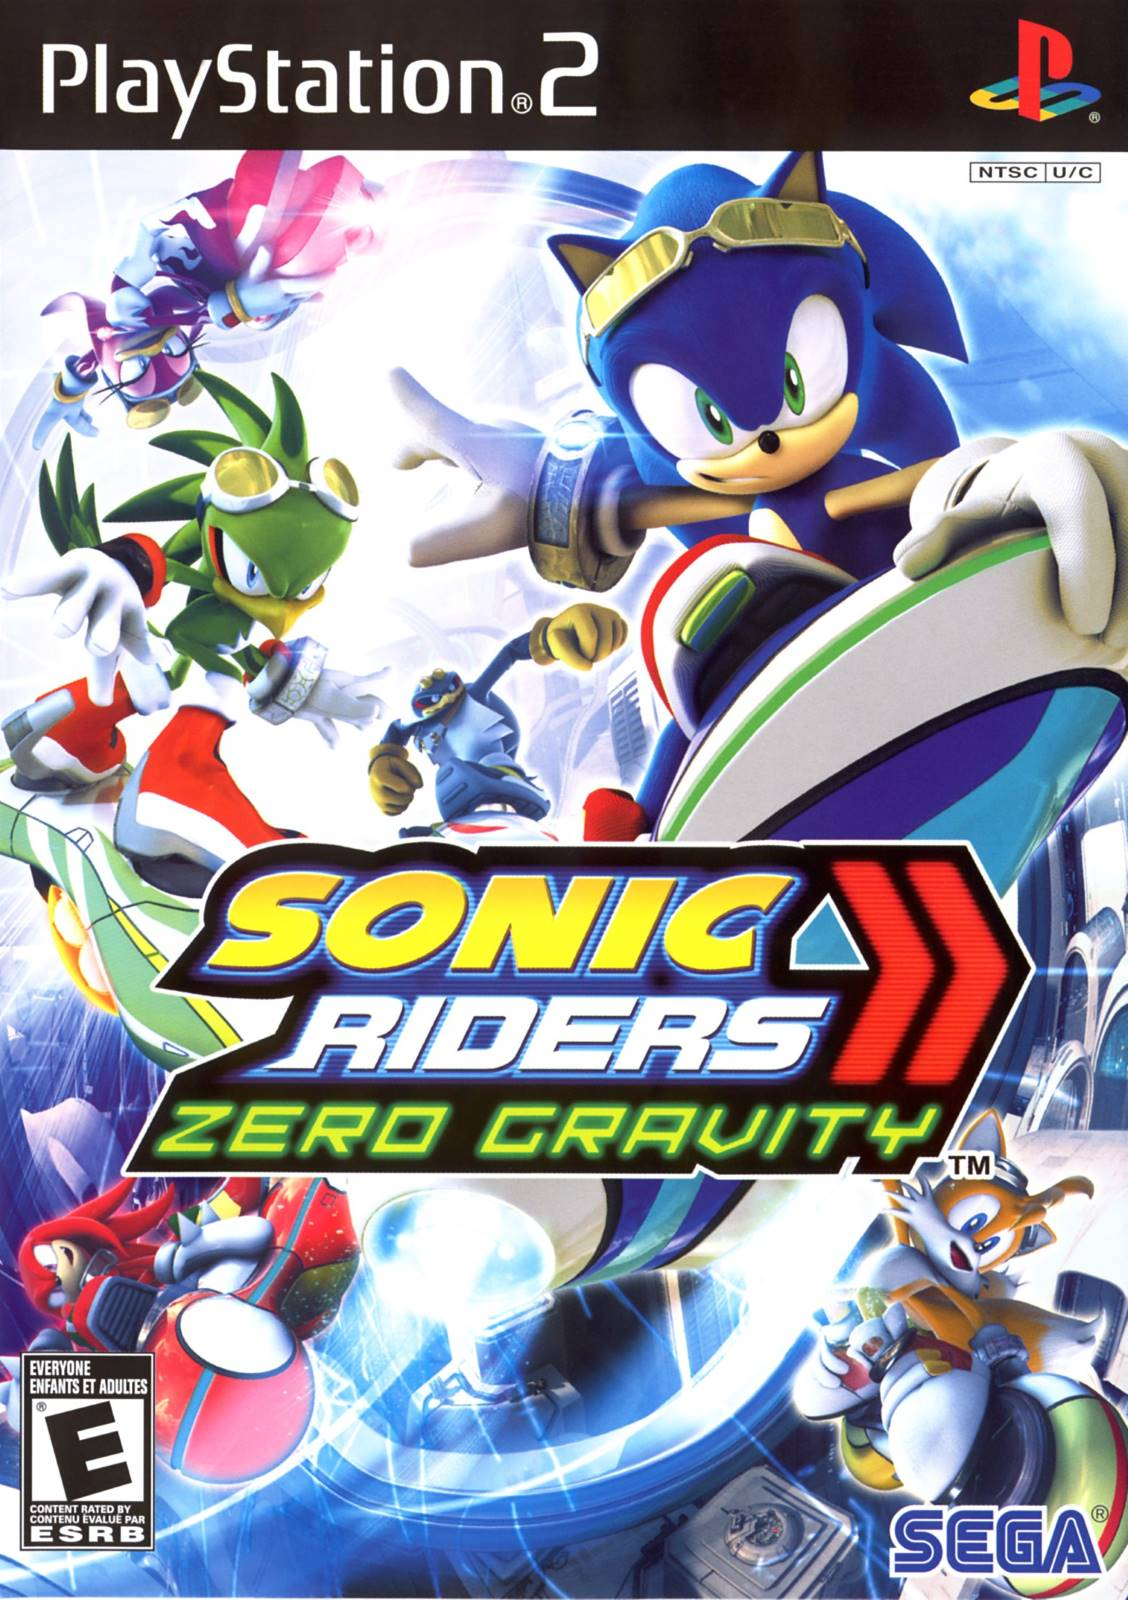 ps2_sonic_riders_zero_gravity_p_tmw3rr.jpg